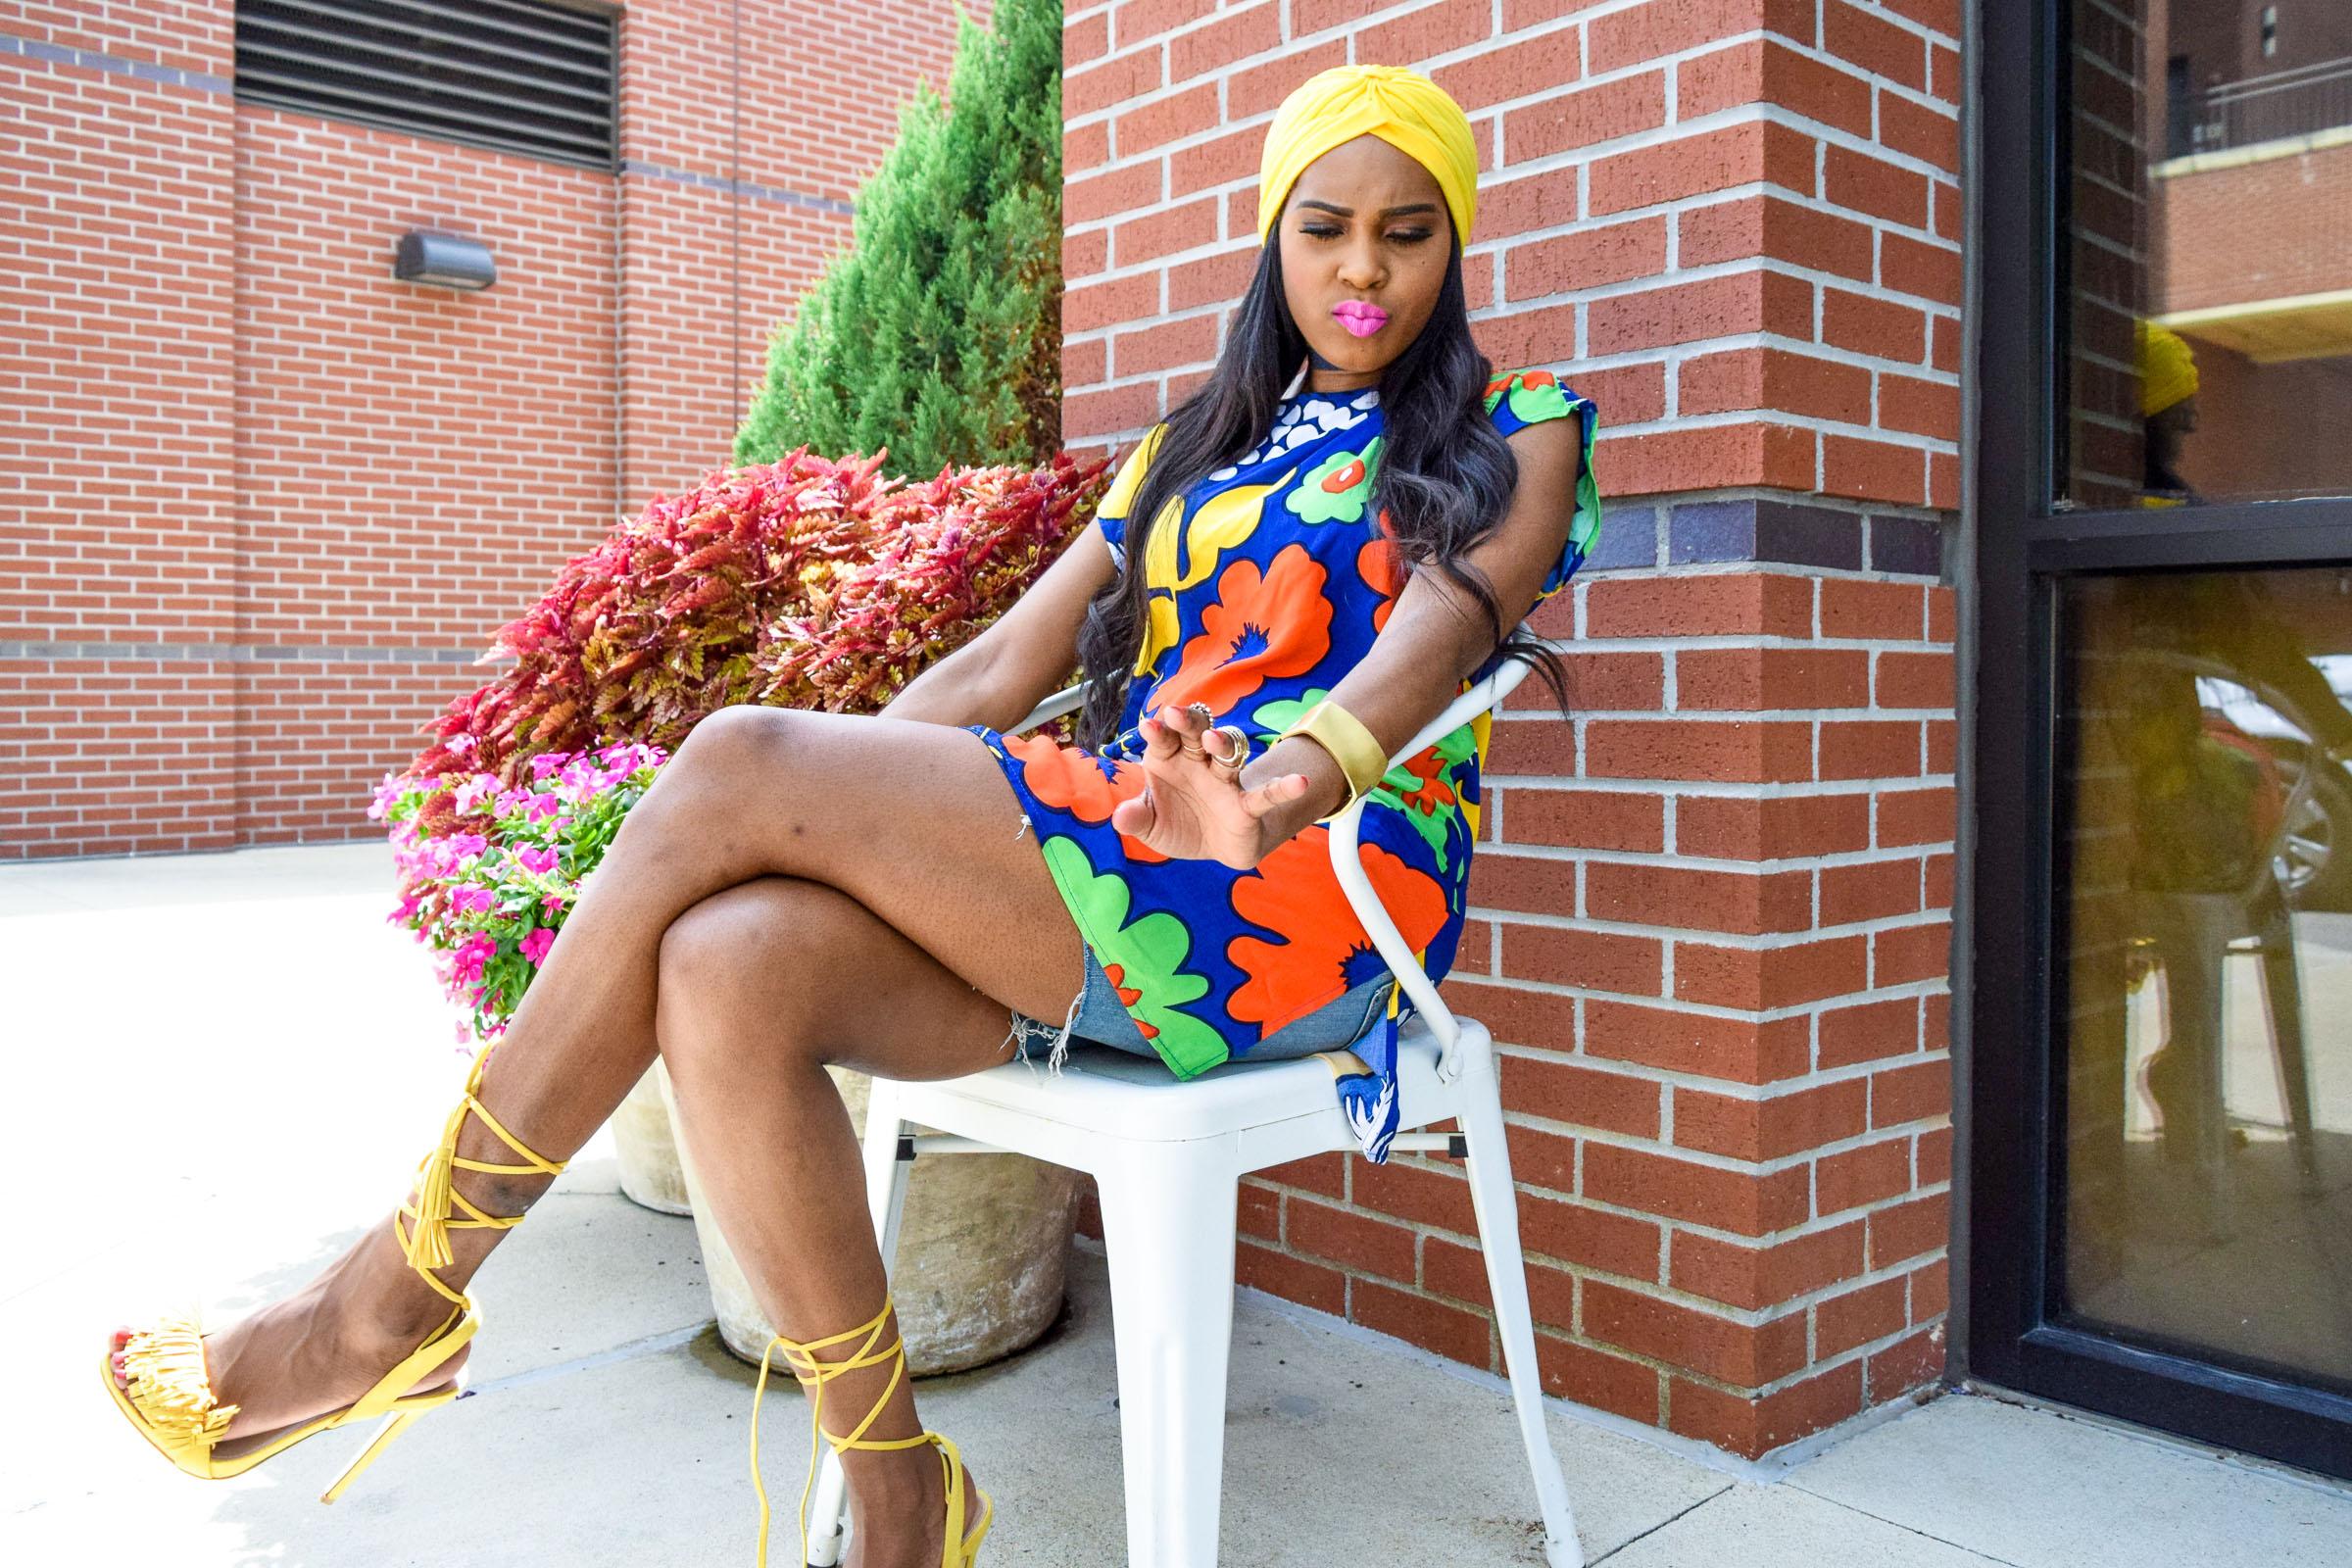 Style-Files-Target-Marimeko-collection -floral-tunic-justfab-tayrey-yellow-fringe-heels-sandals-yellow-turban-asos-denim-choker-oohlalablog-